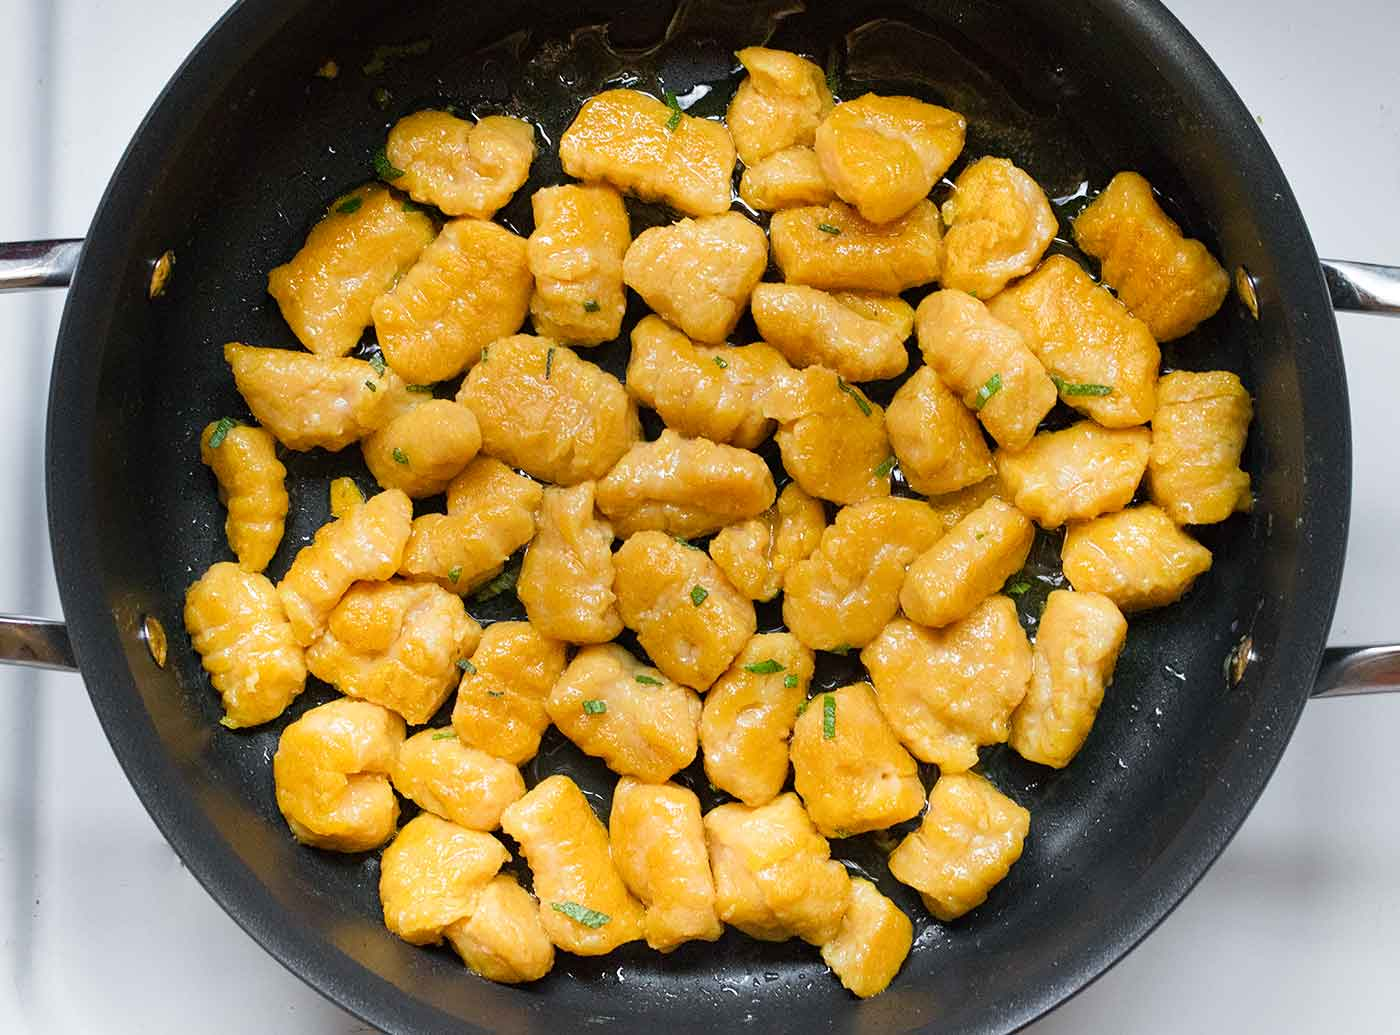 Pan-fried pumpkin gnocchi for creamy pumpkin soup